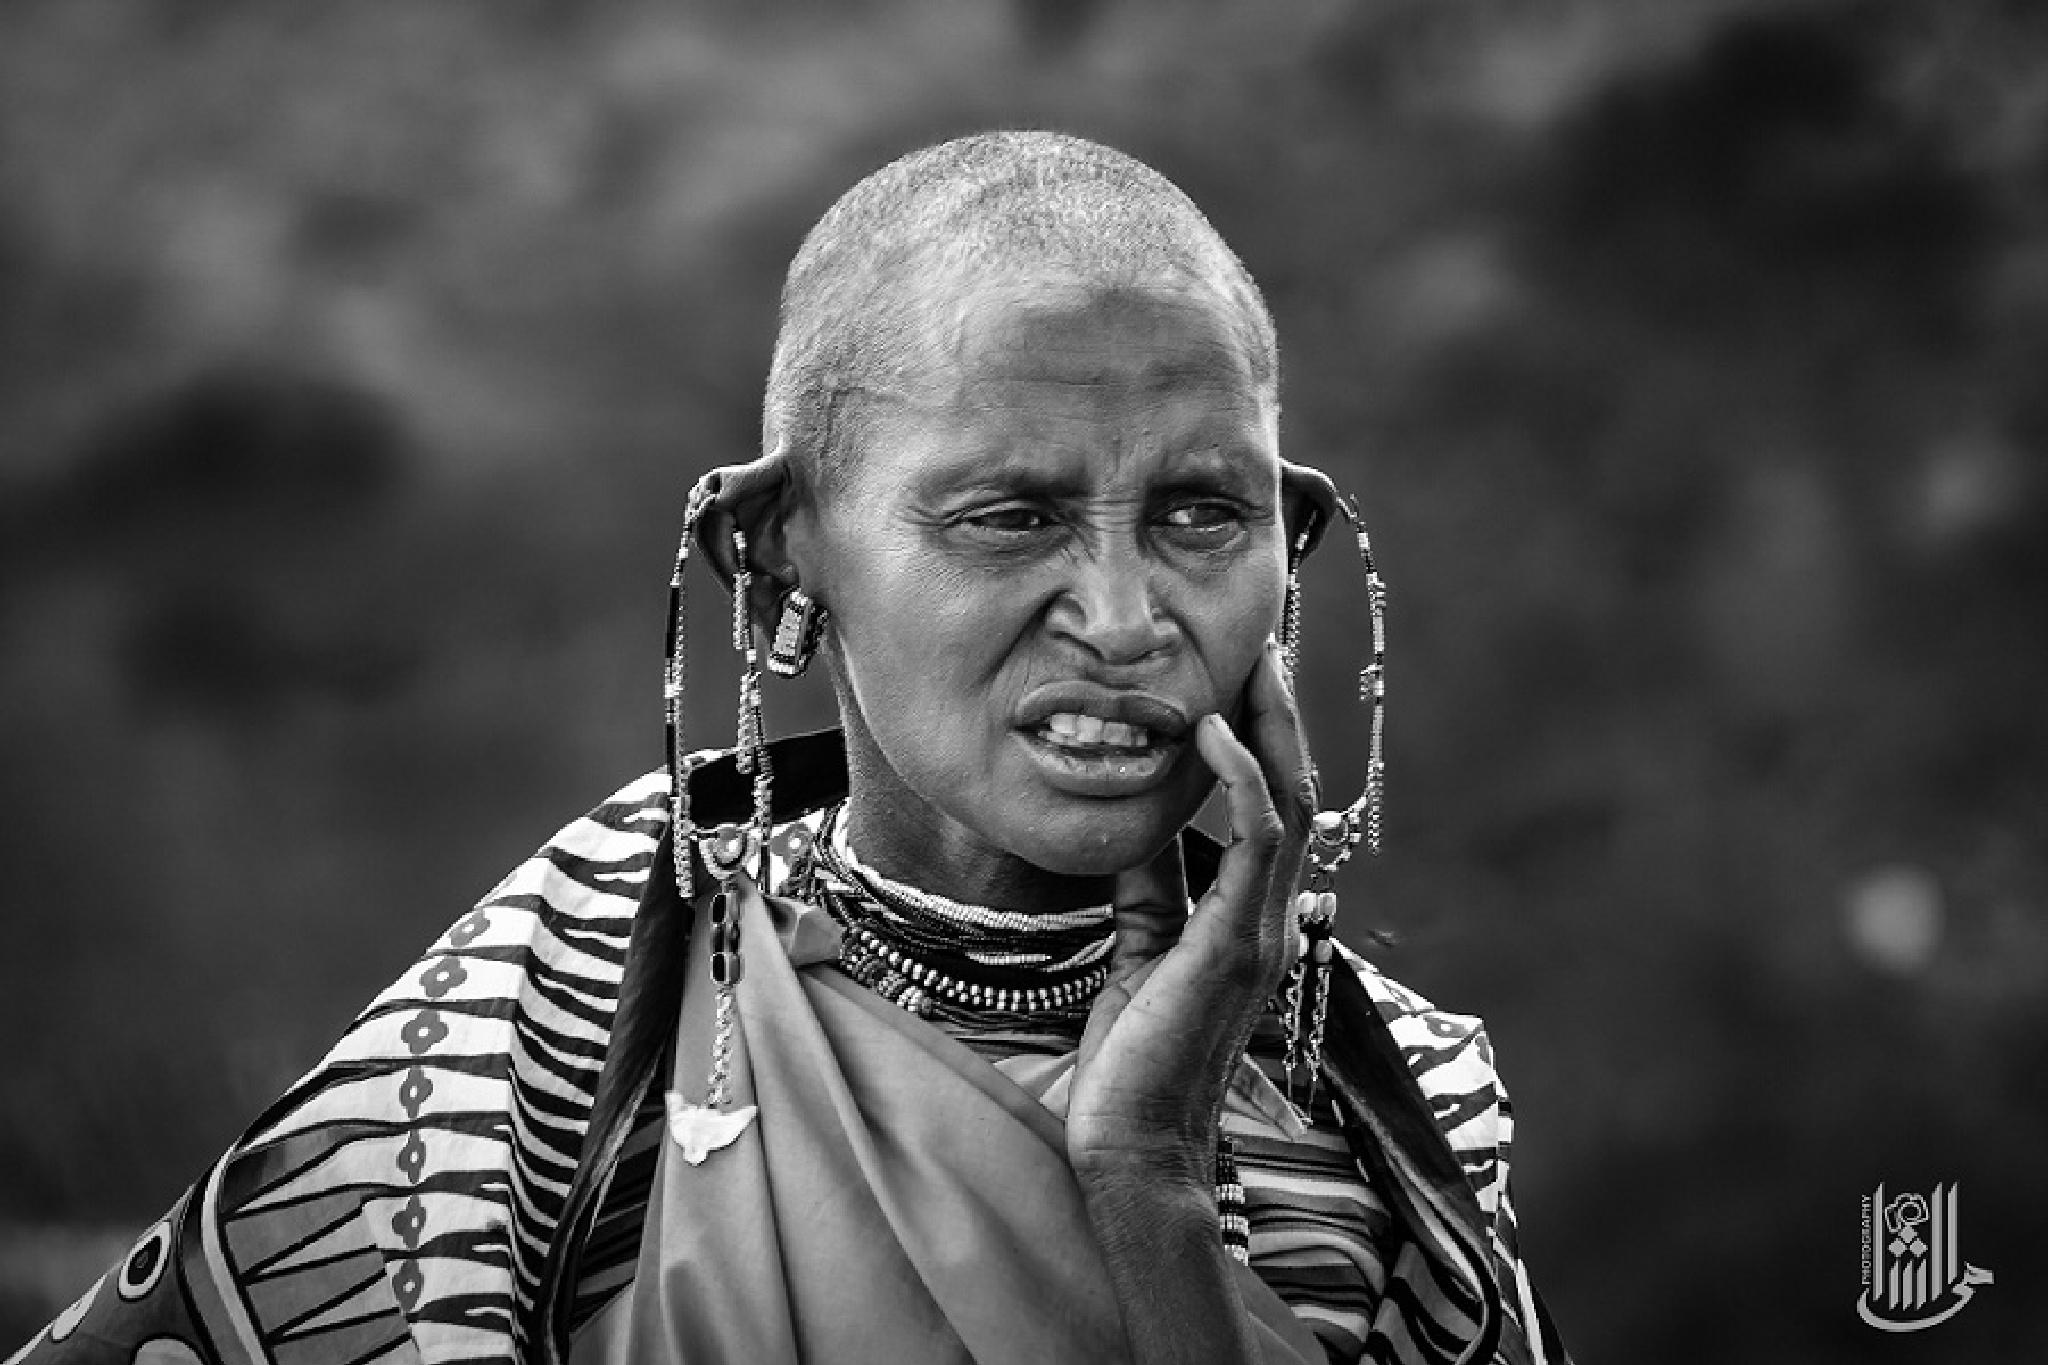 Kenya Faces by Mahmoud Elshamy